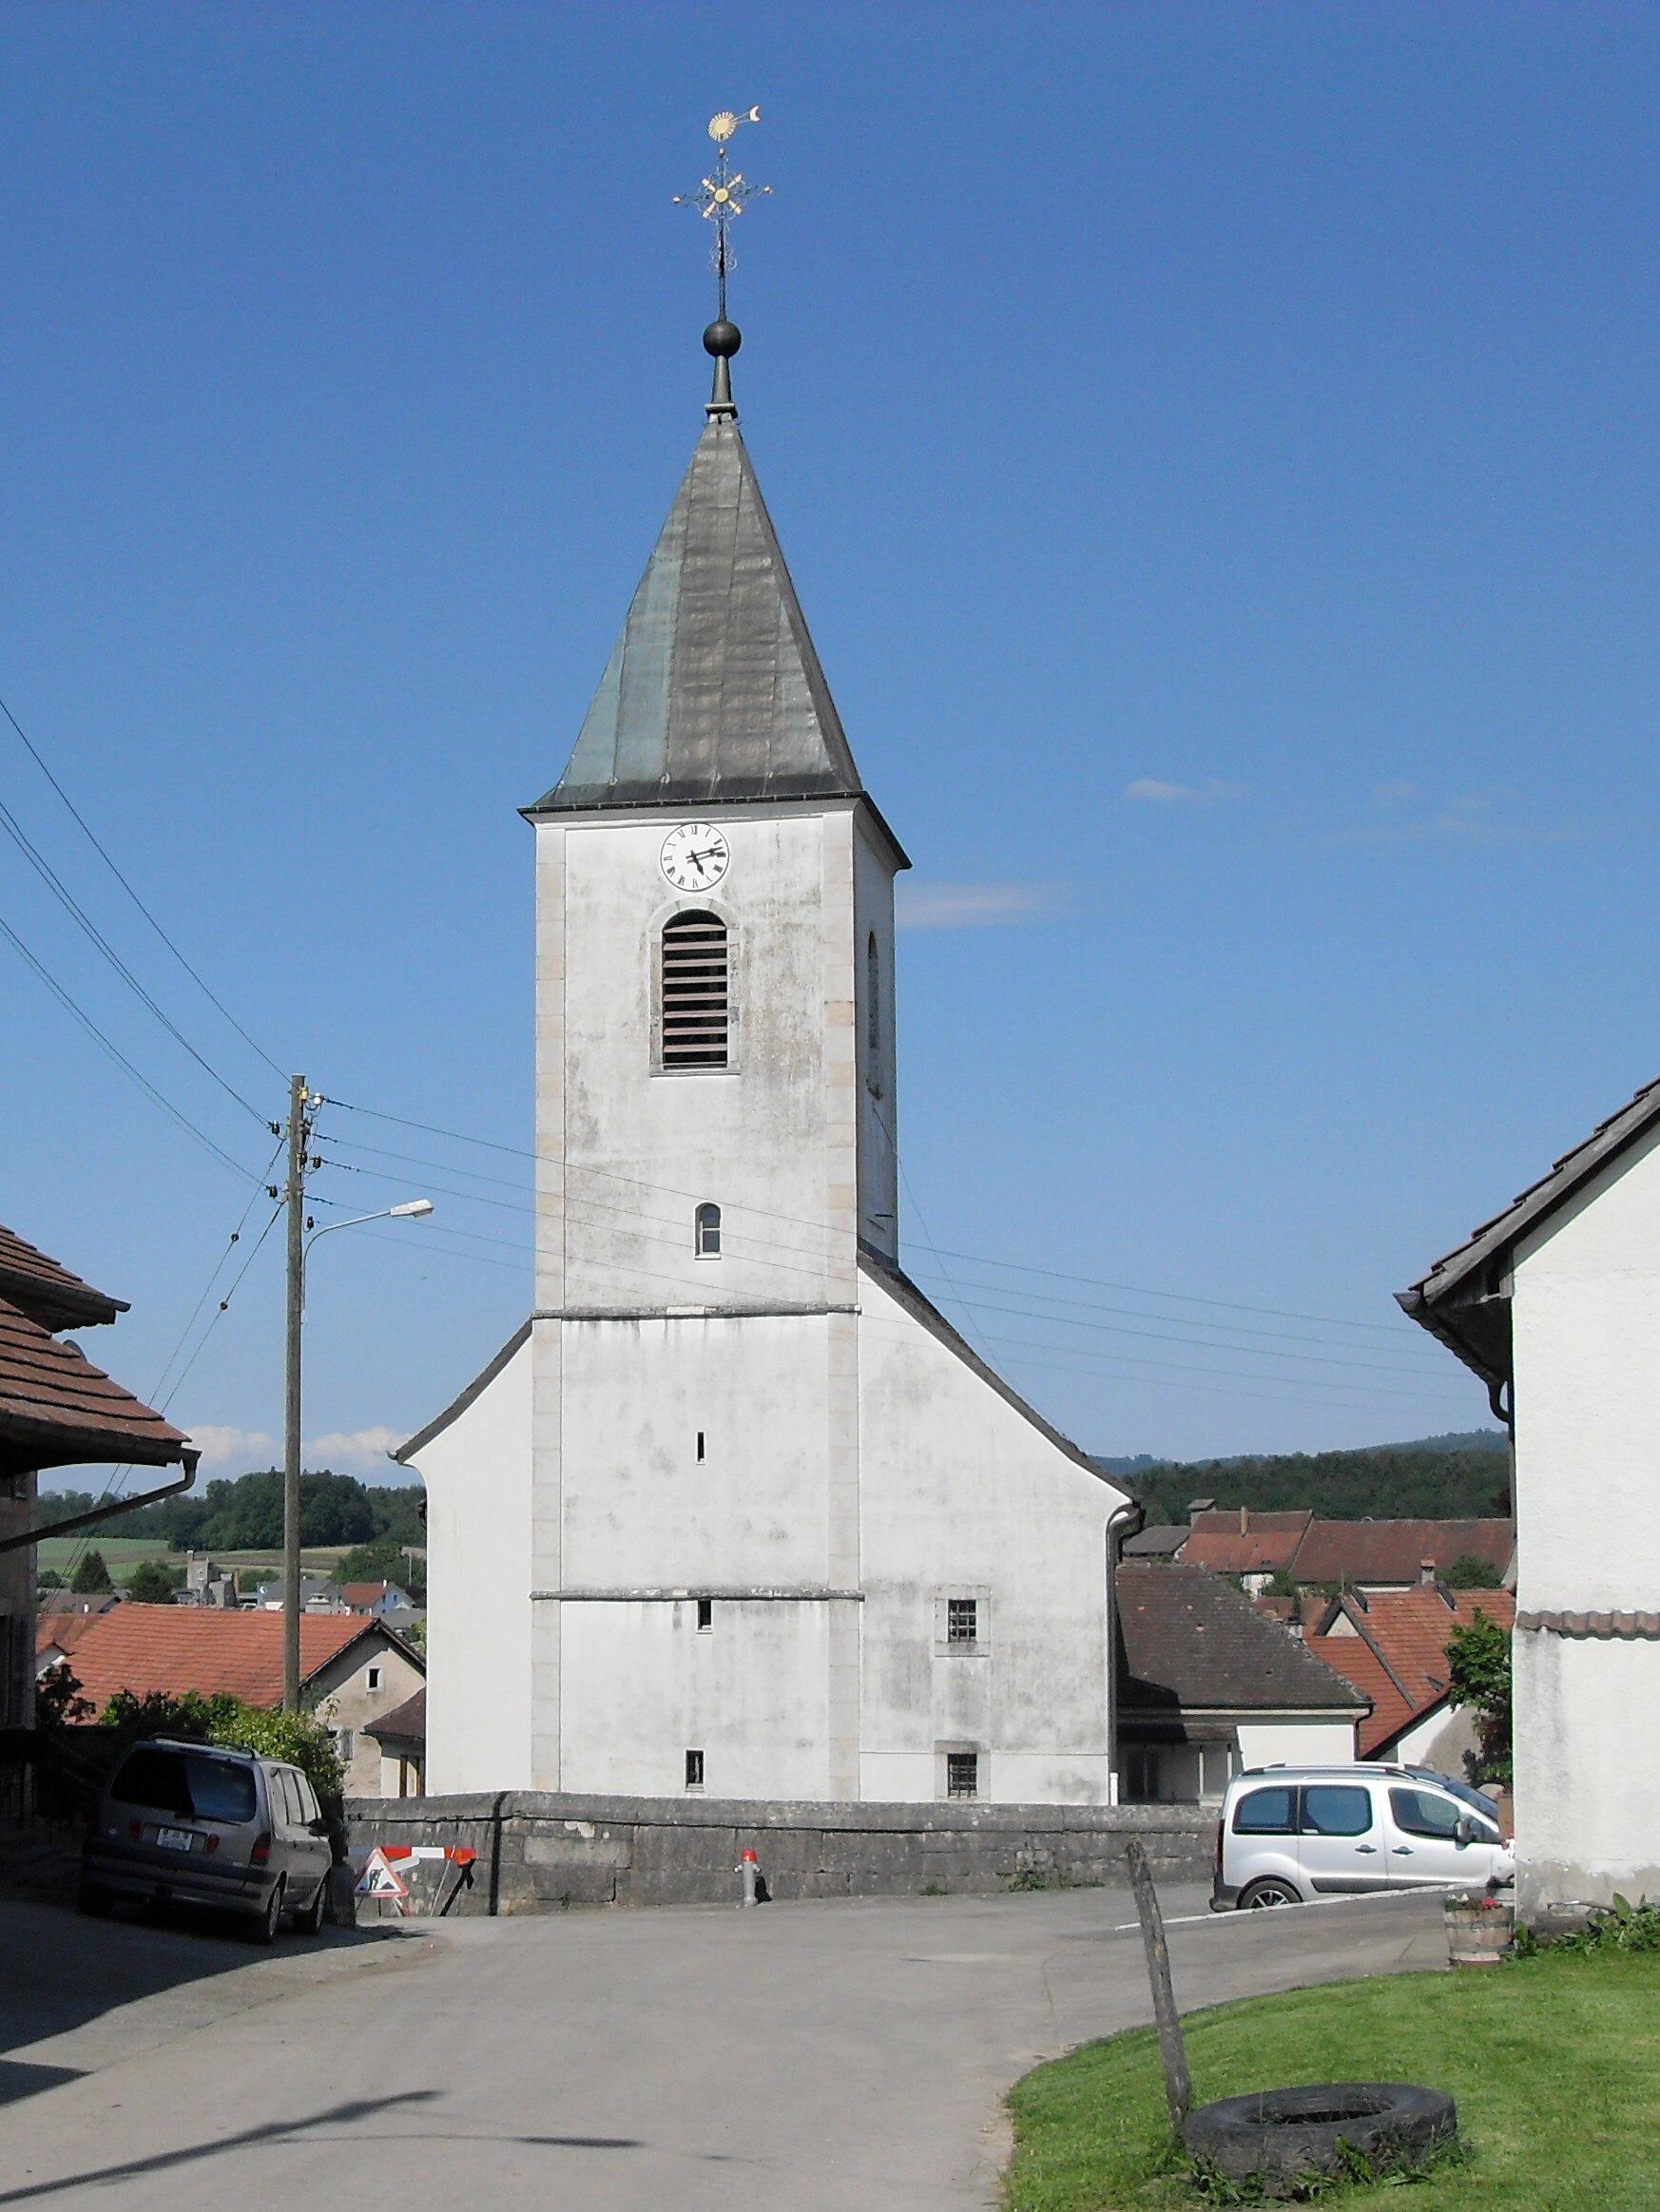 Vendlincourt